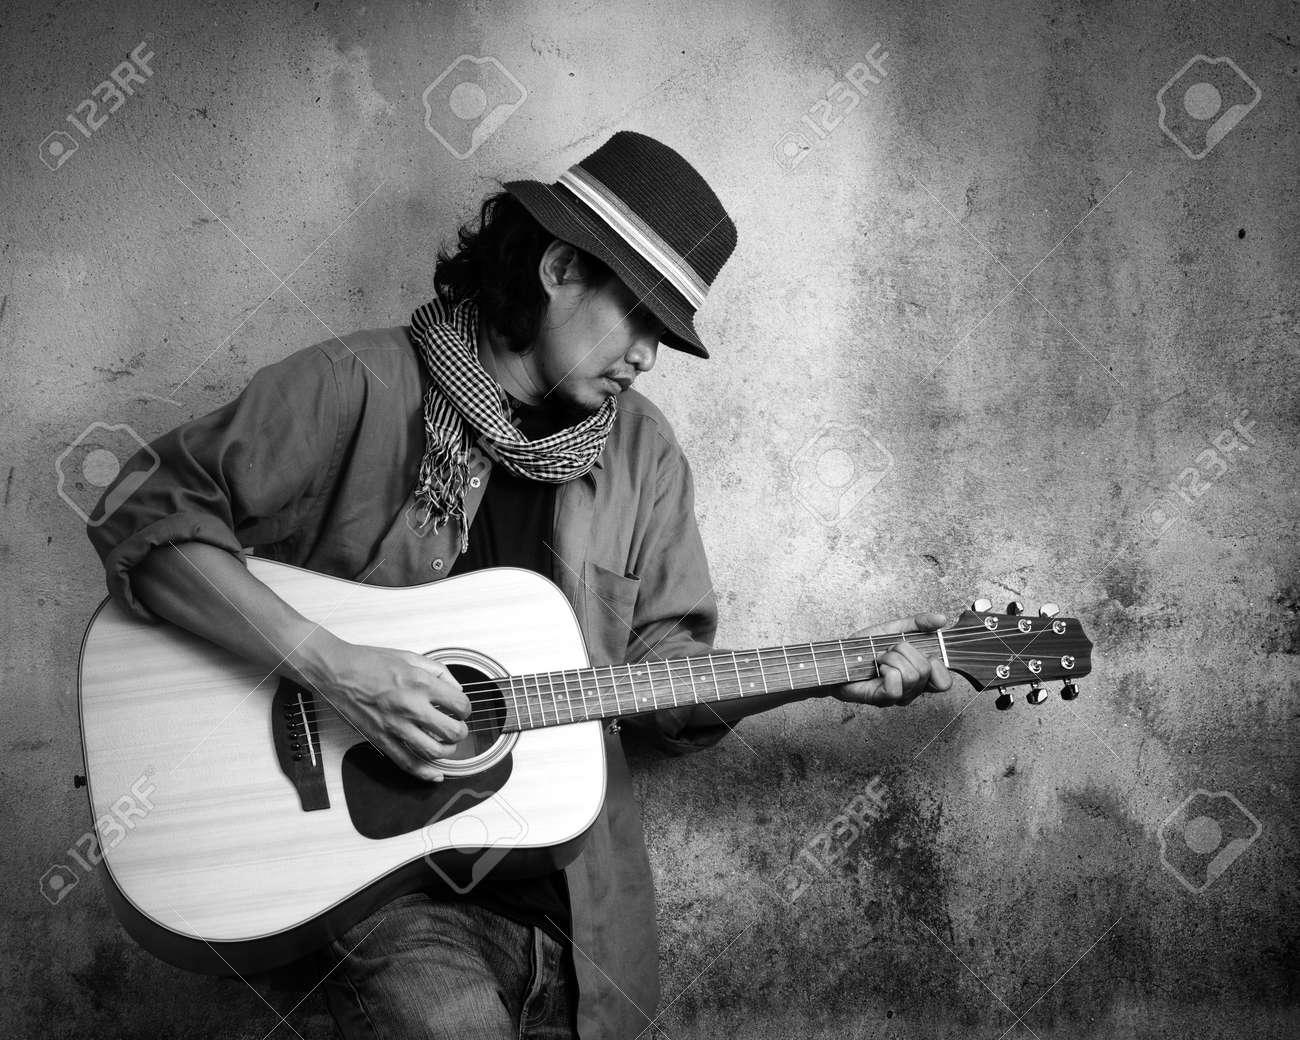 Man Playing Guitar Black And White Photo